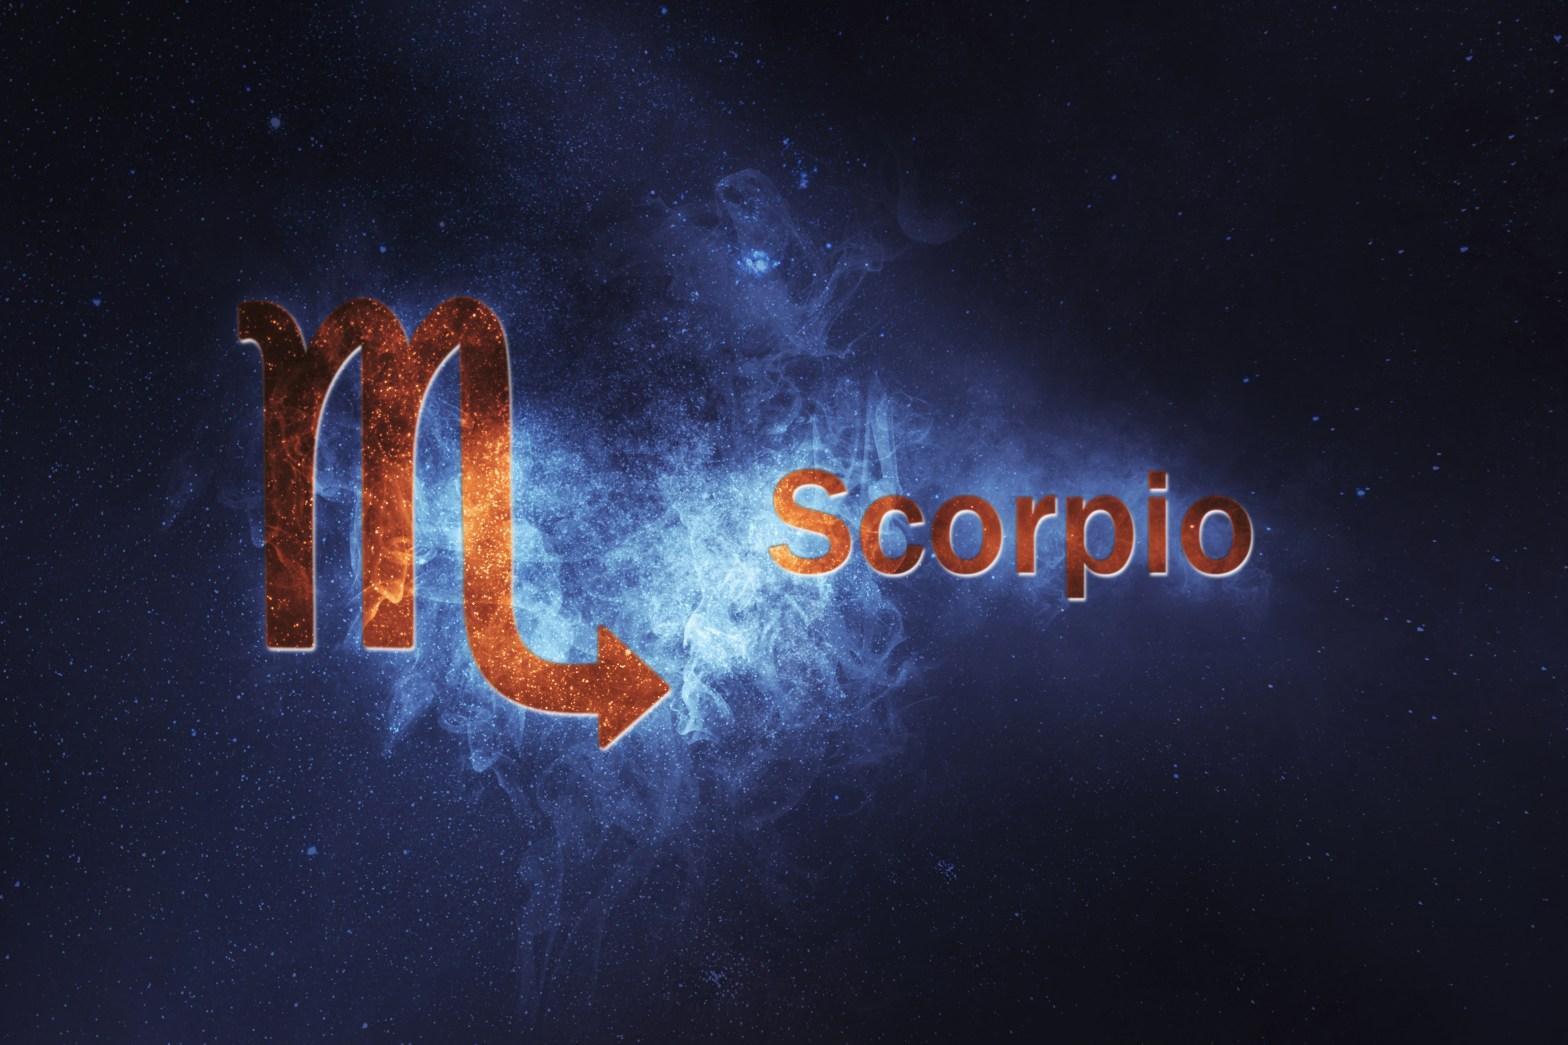 scorpio super powers, scorpio superpowers, scorpio psychic, scorpio psychic abilities, scorpio abilities